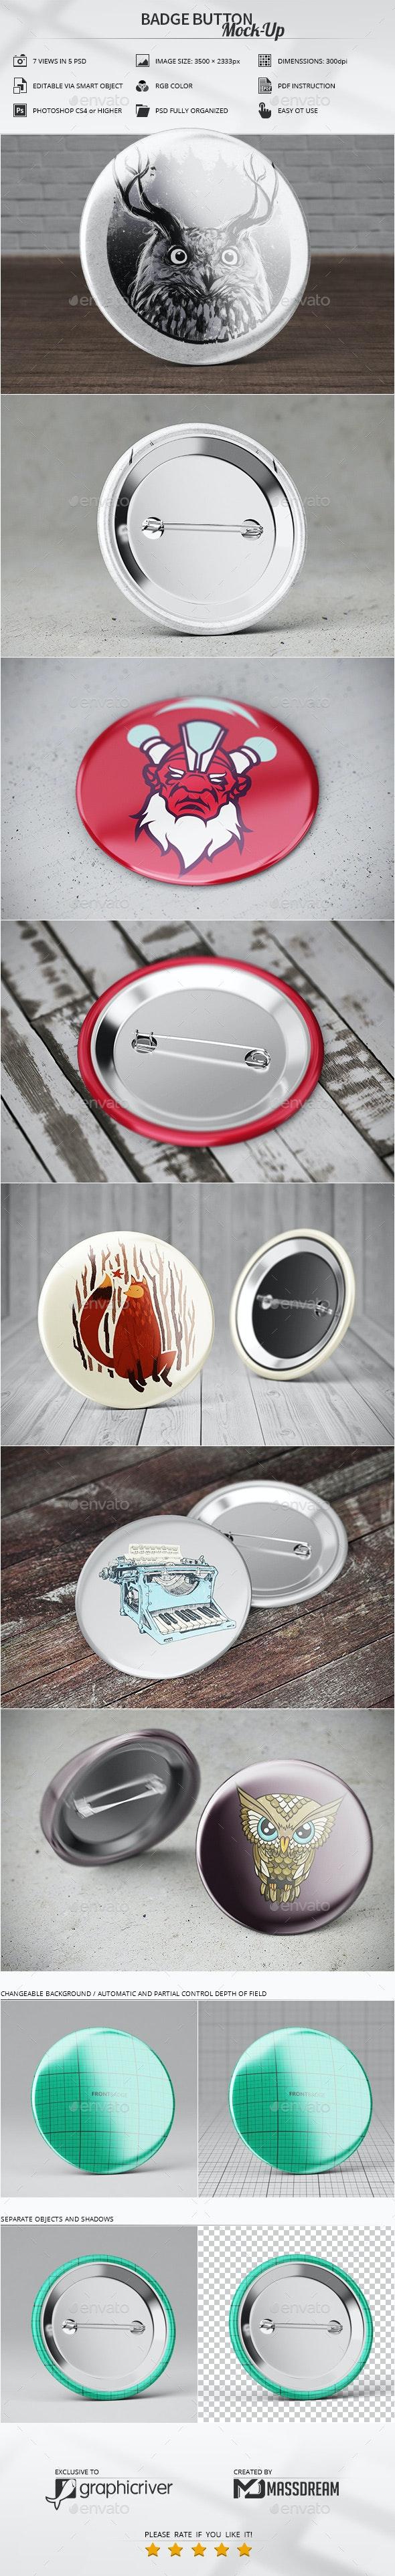 Badge Button Mock-Up - Print Product Mock-Ups